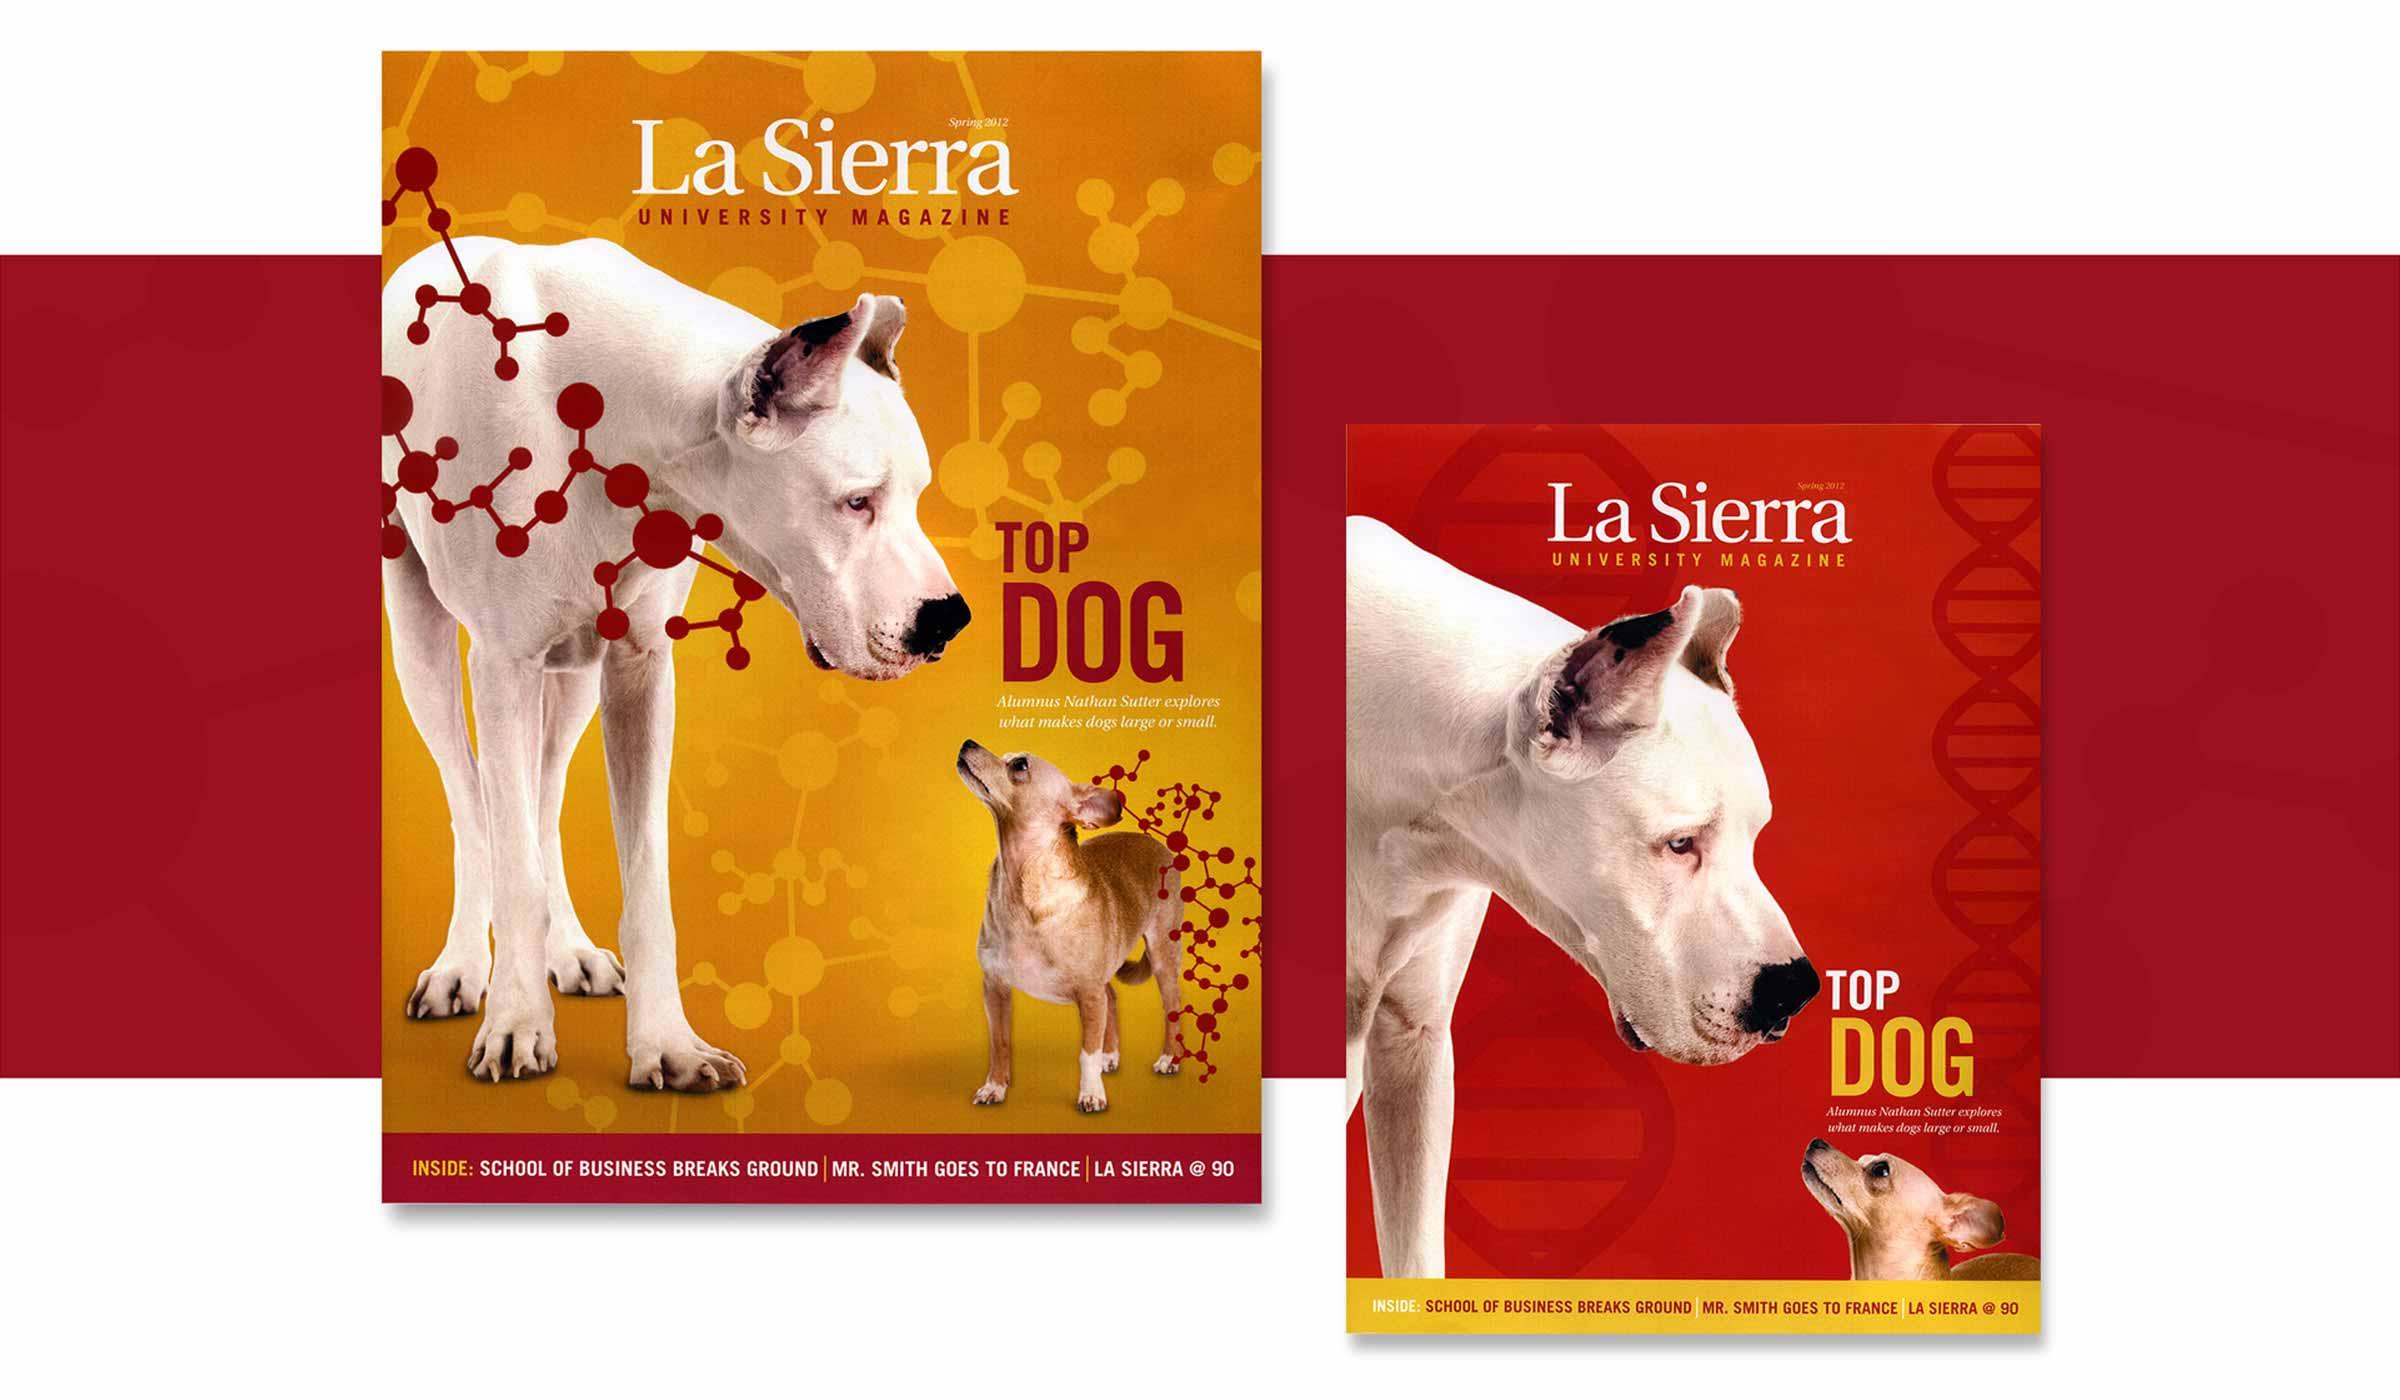 La Sierra University Magazine Covers